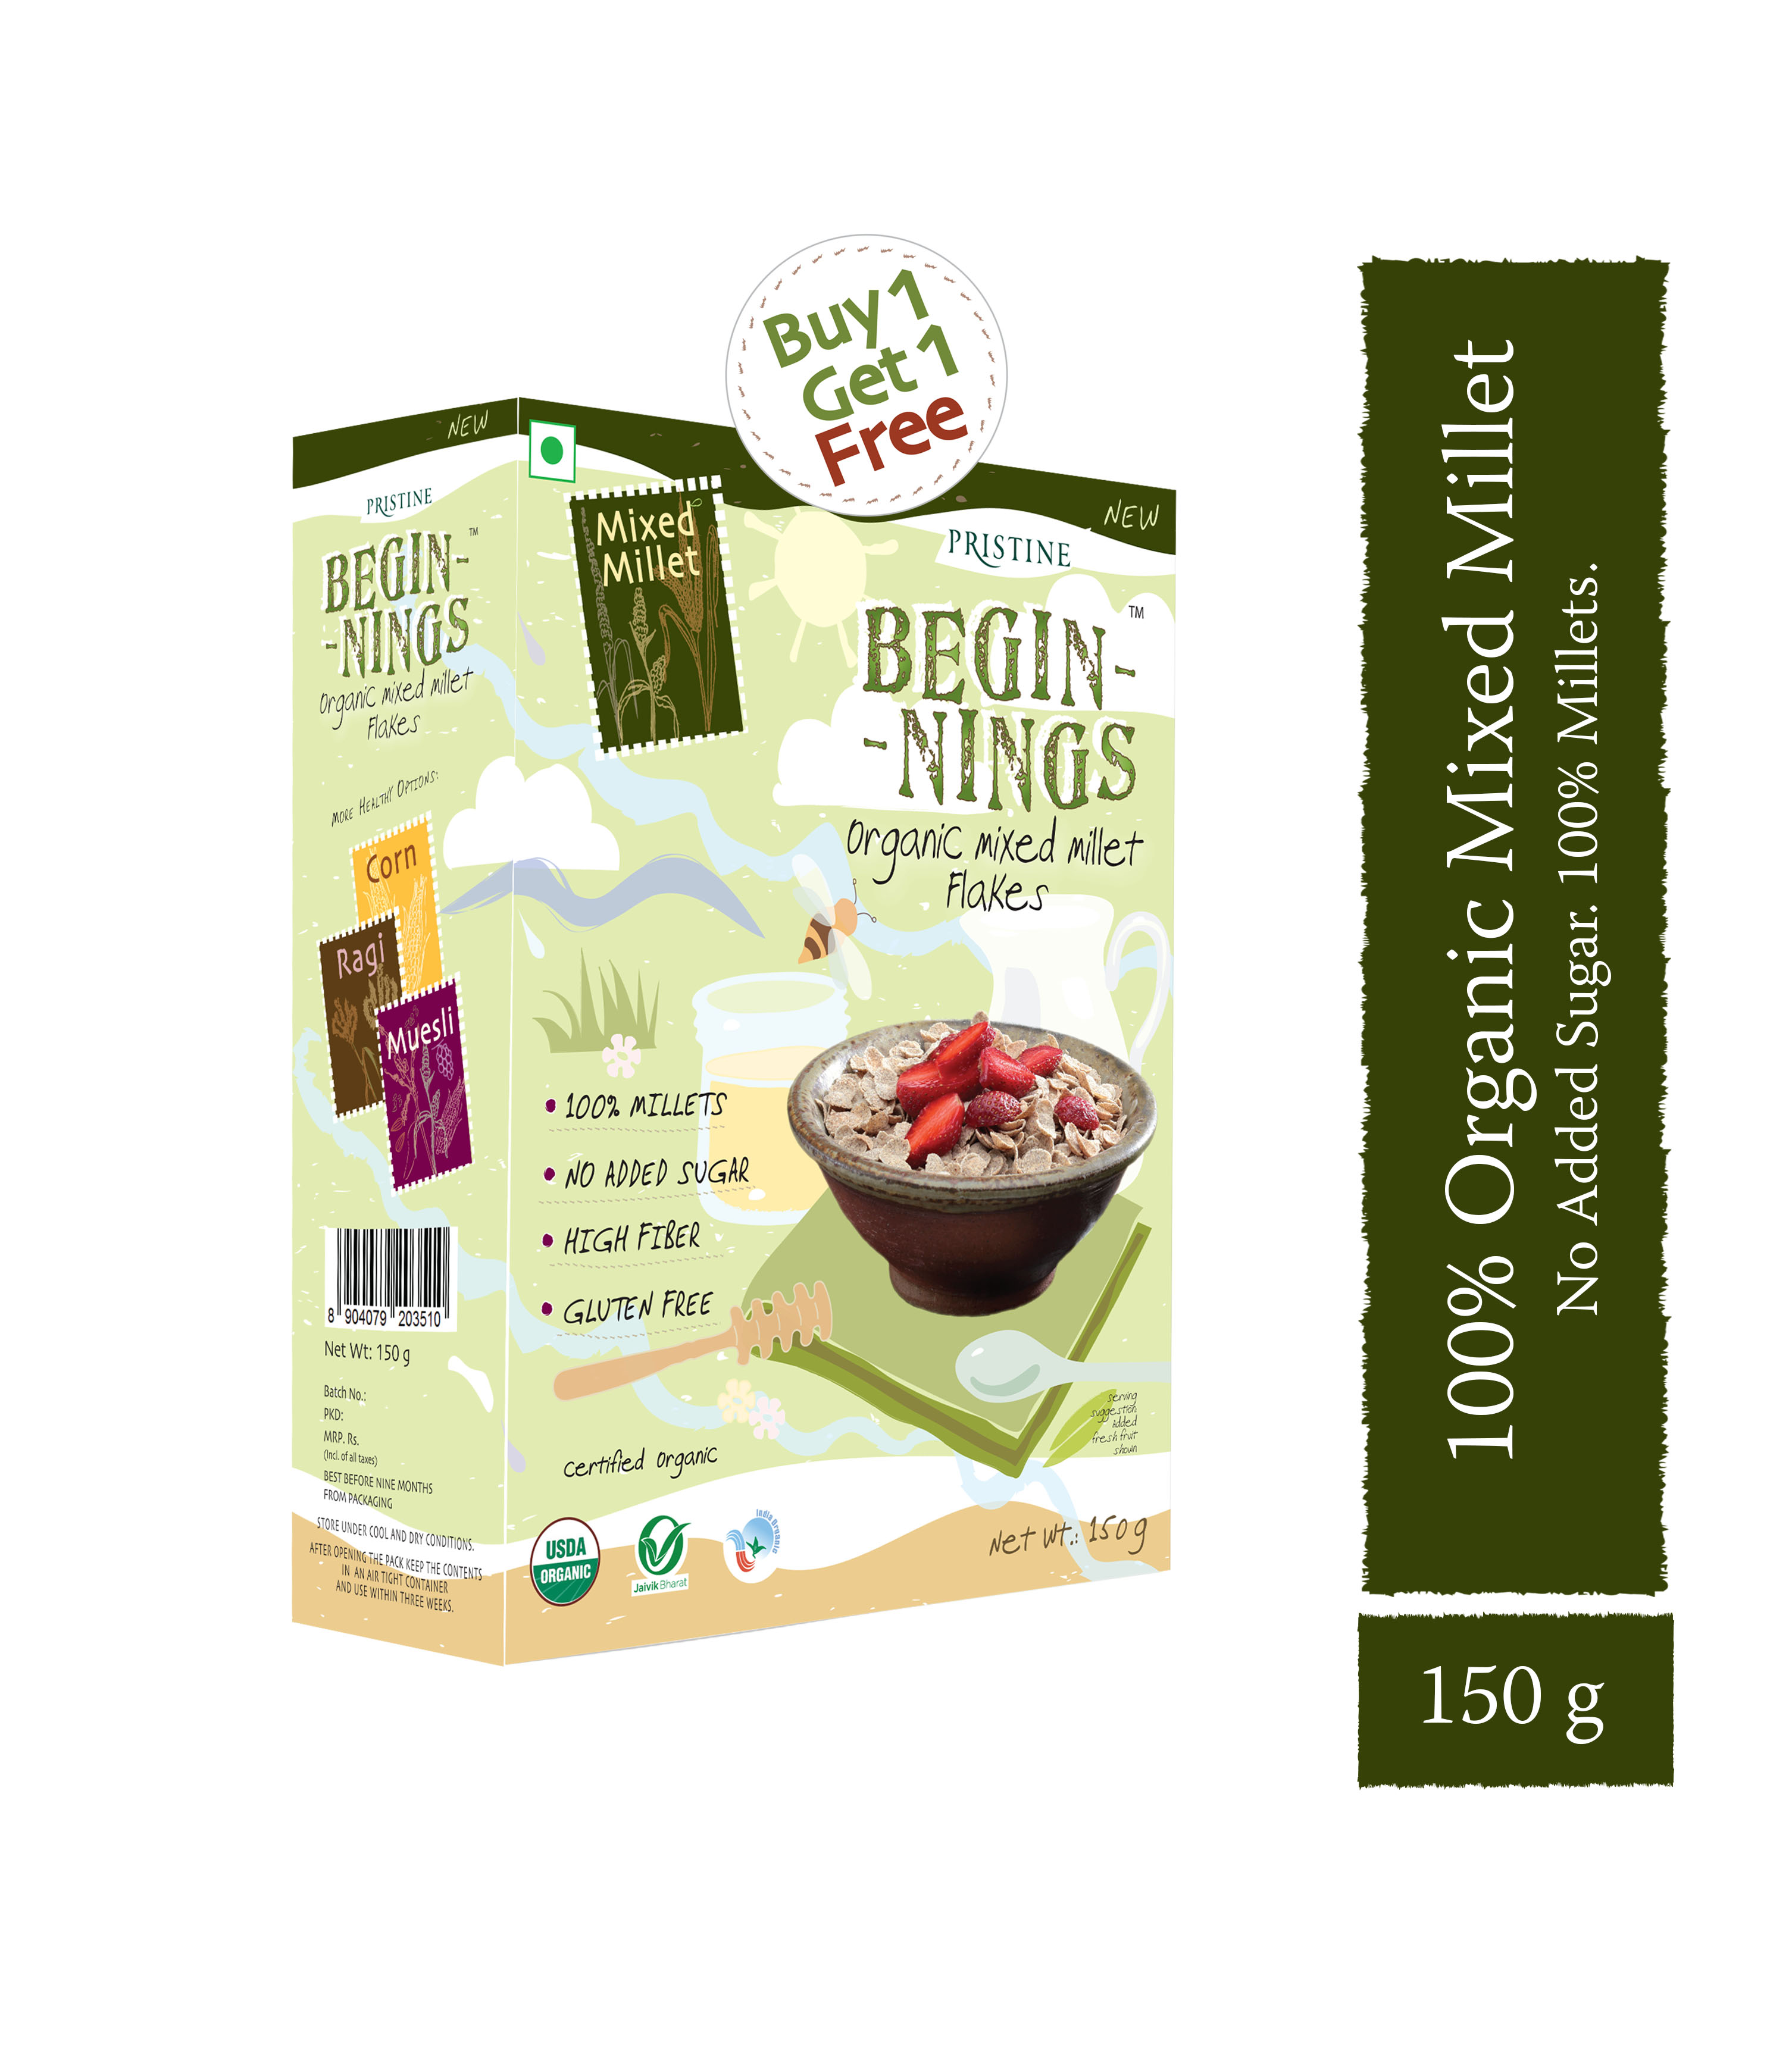 Organic Mixed Millet Flakes,150g - No Added Sugar Breakfast Cereals - Pristine Organics